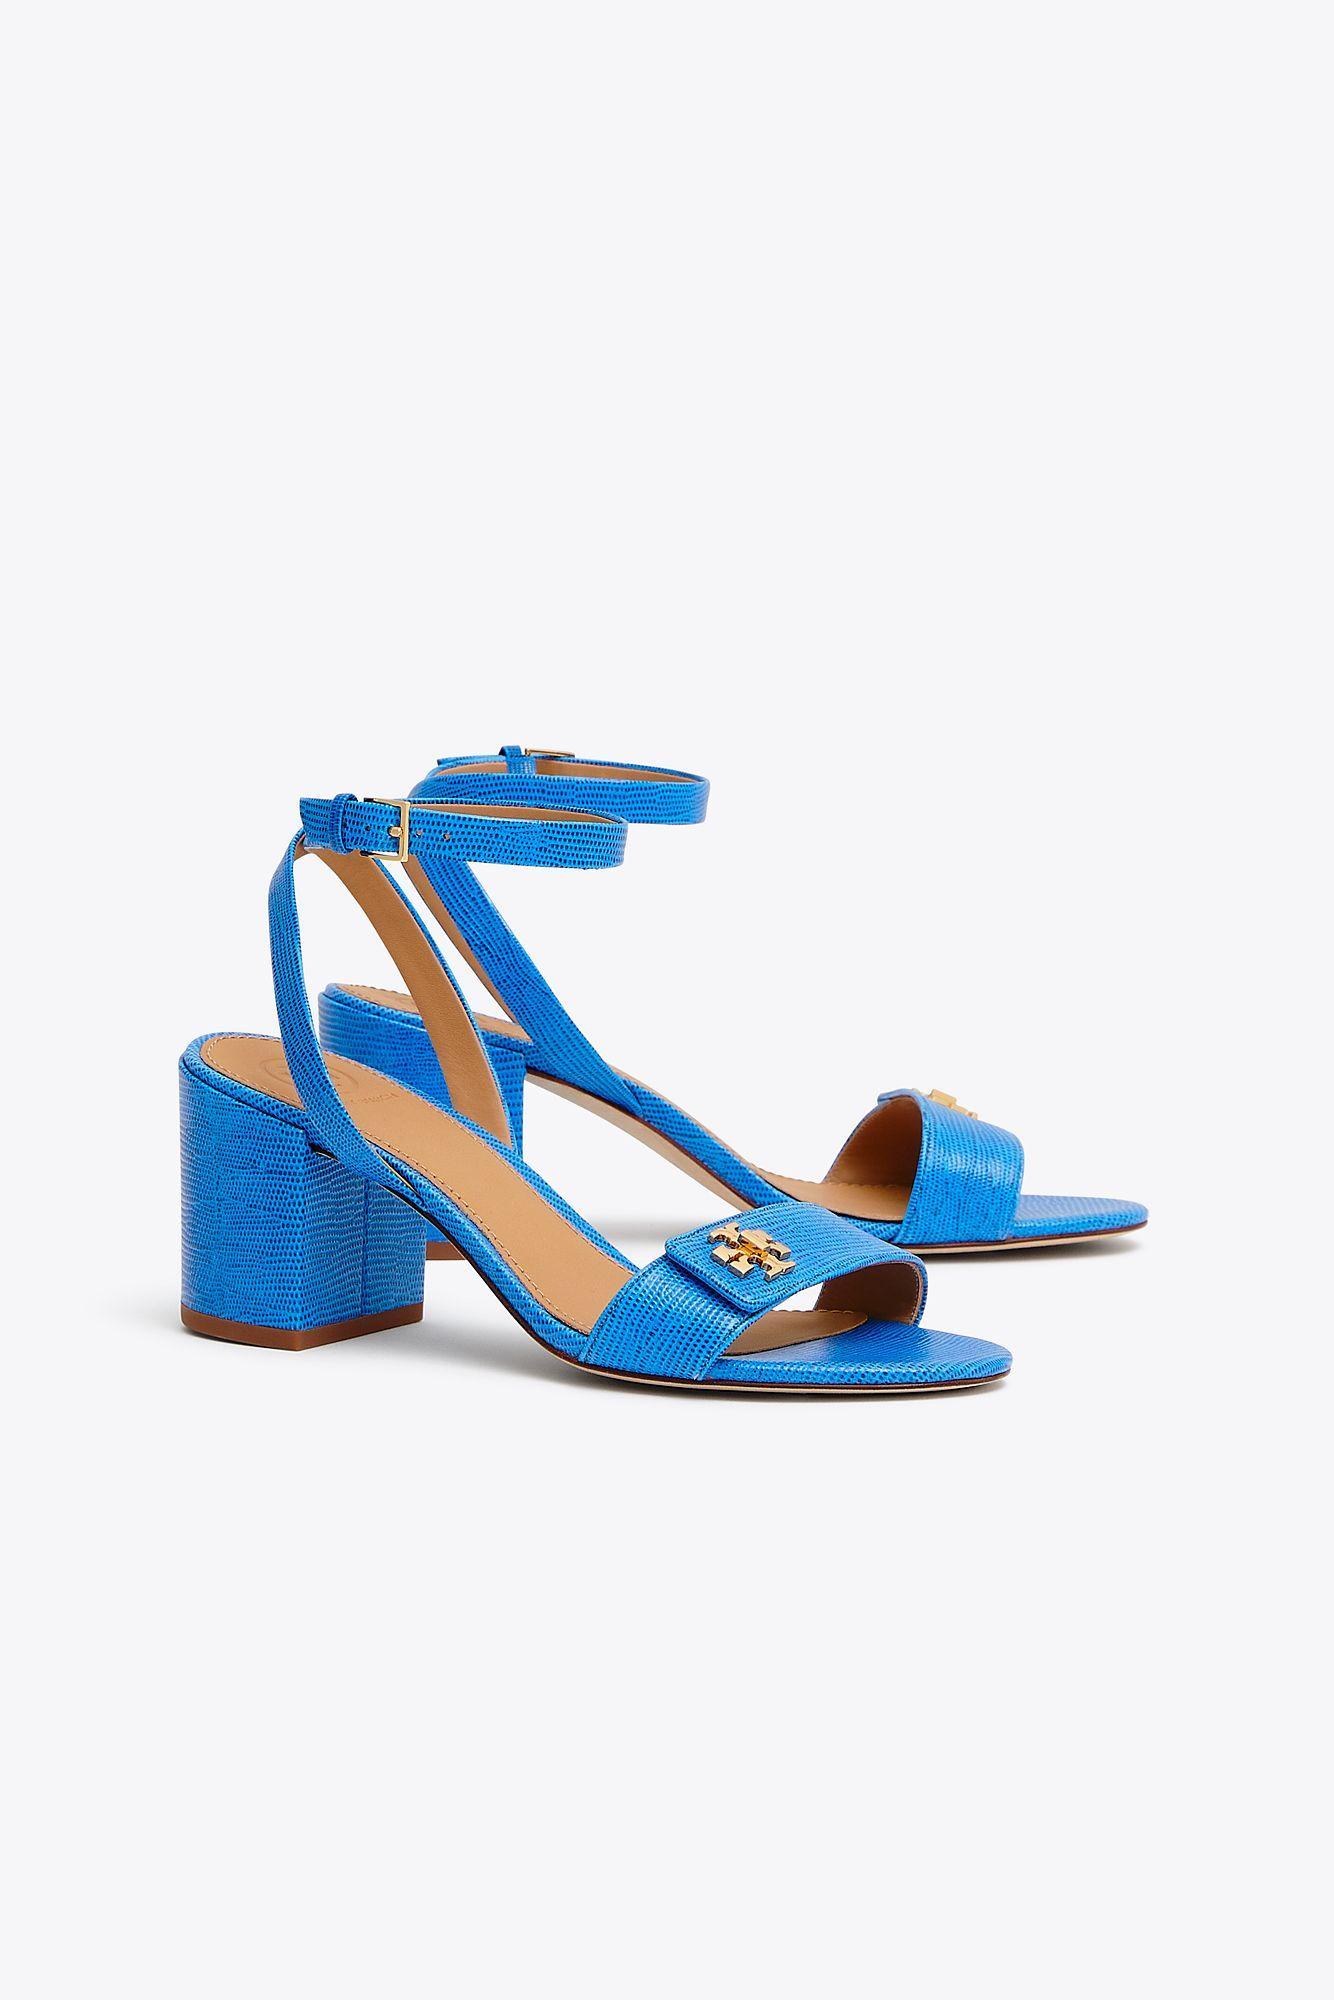 1a984ccb1607 Lyst - Tory Burch Kira Embossed Sandal in Blue